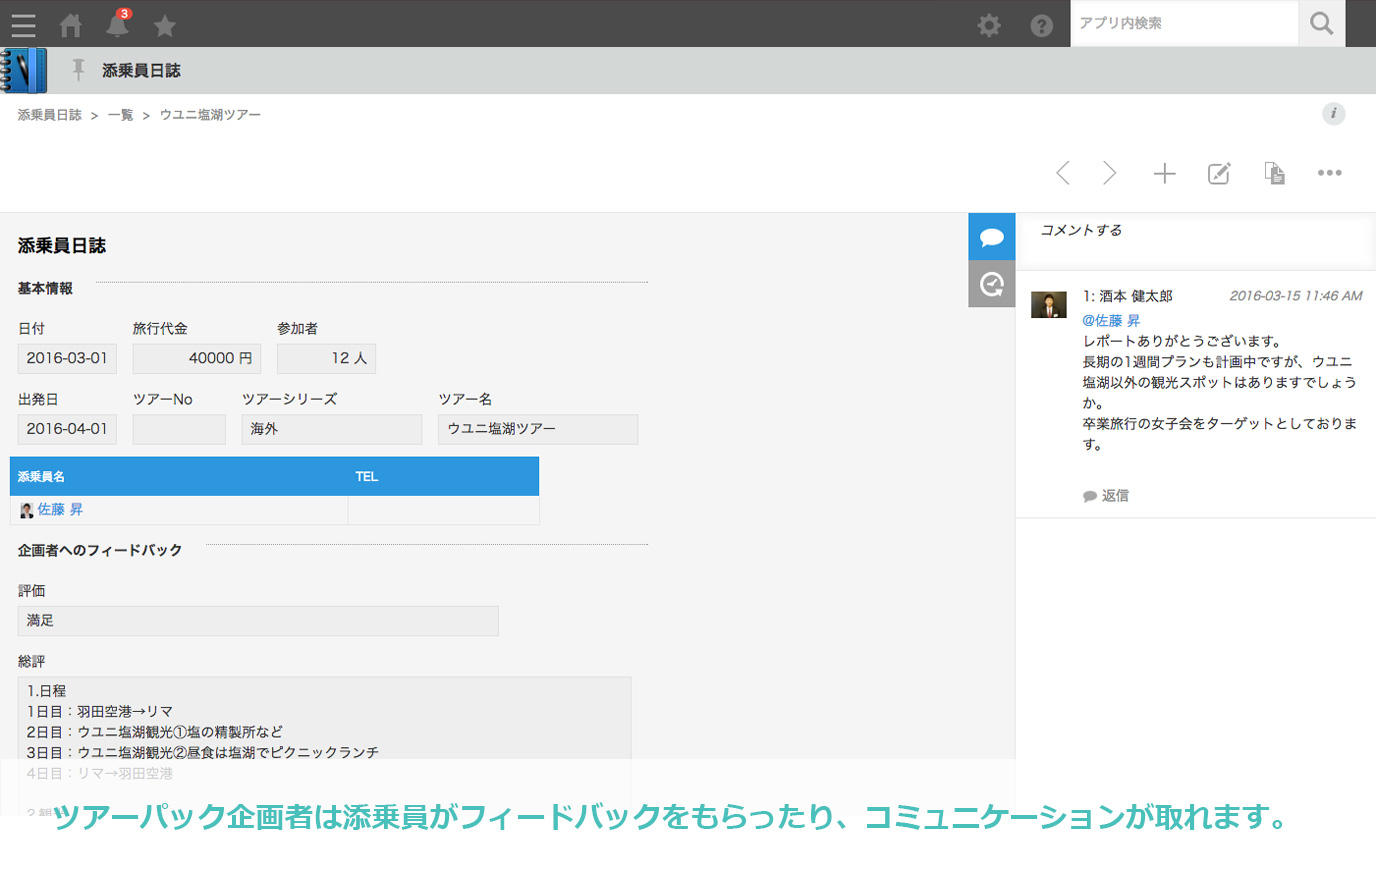 ktp_47_3.jpg